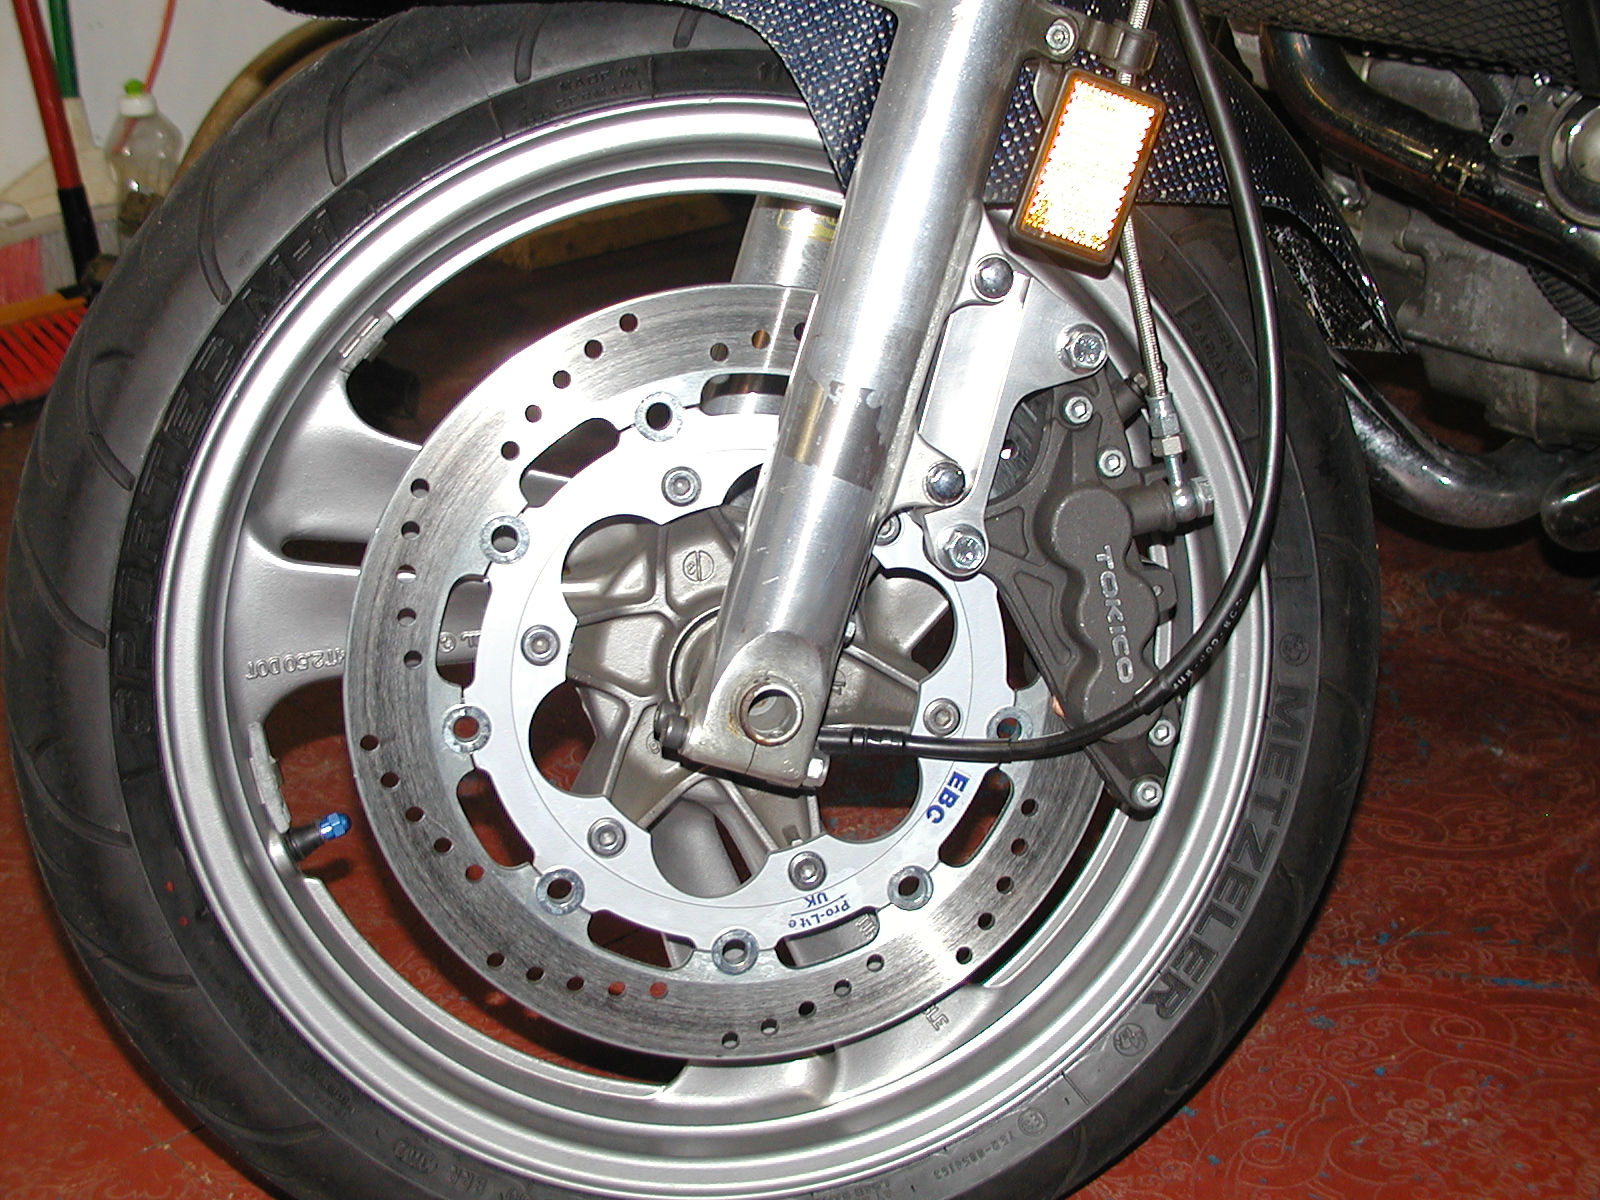 Ebc Brakes Review >> Steve Lenac's Tokico brake caliper adapter